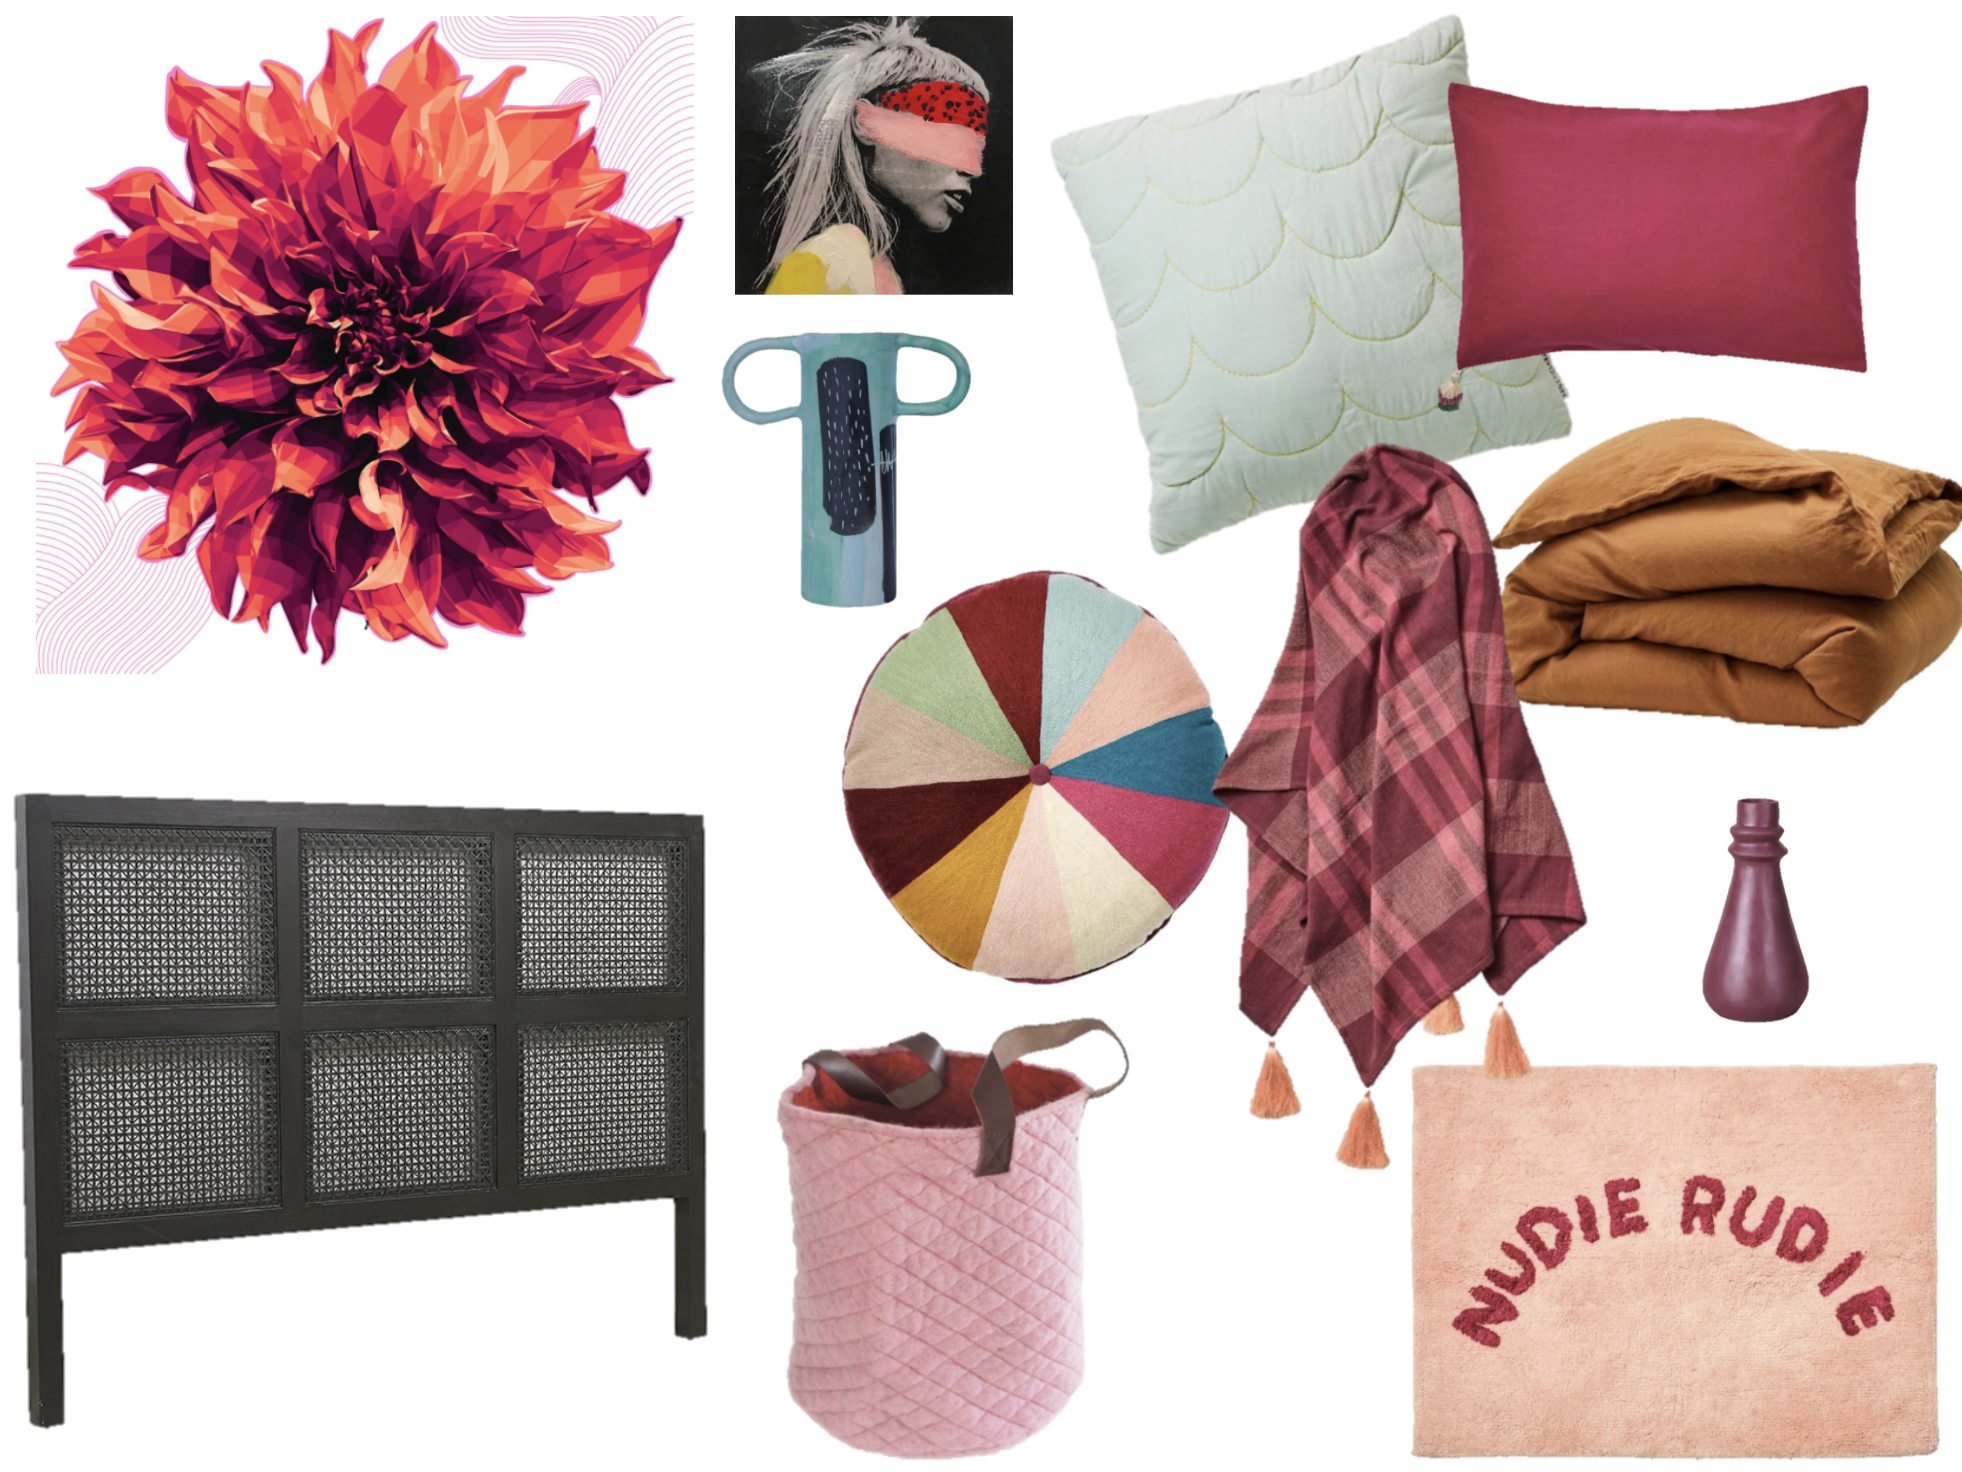 Brent Rosenberg print /  Georgie Wilson mini canvas / J ade cushion /  Magenta pillowcase /  Tobacco quilt cover /  Peony throw /  Round cushion /  Green painted vase /  Pomegranate vase /  Storage Basket  /  Bath Mat